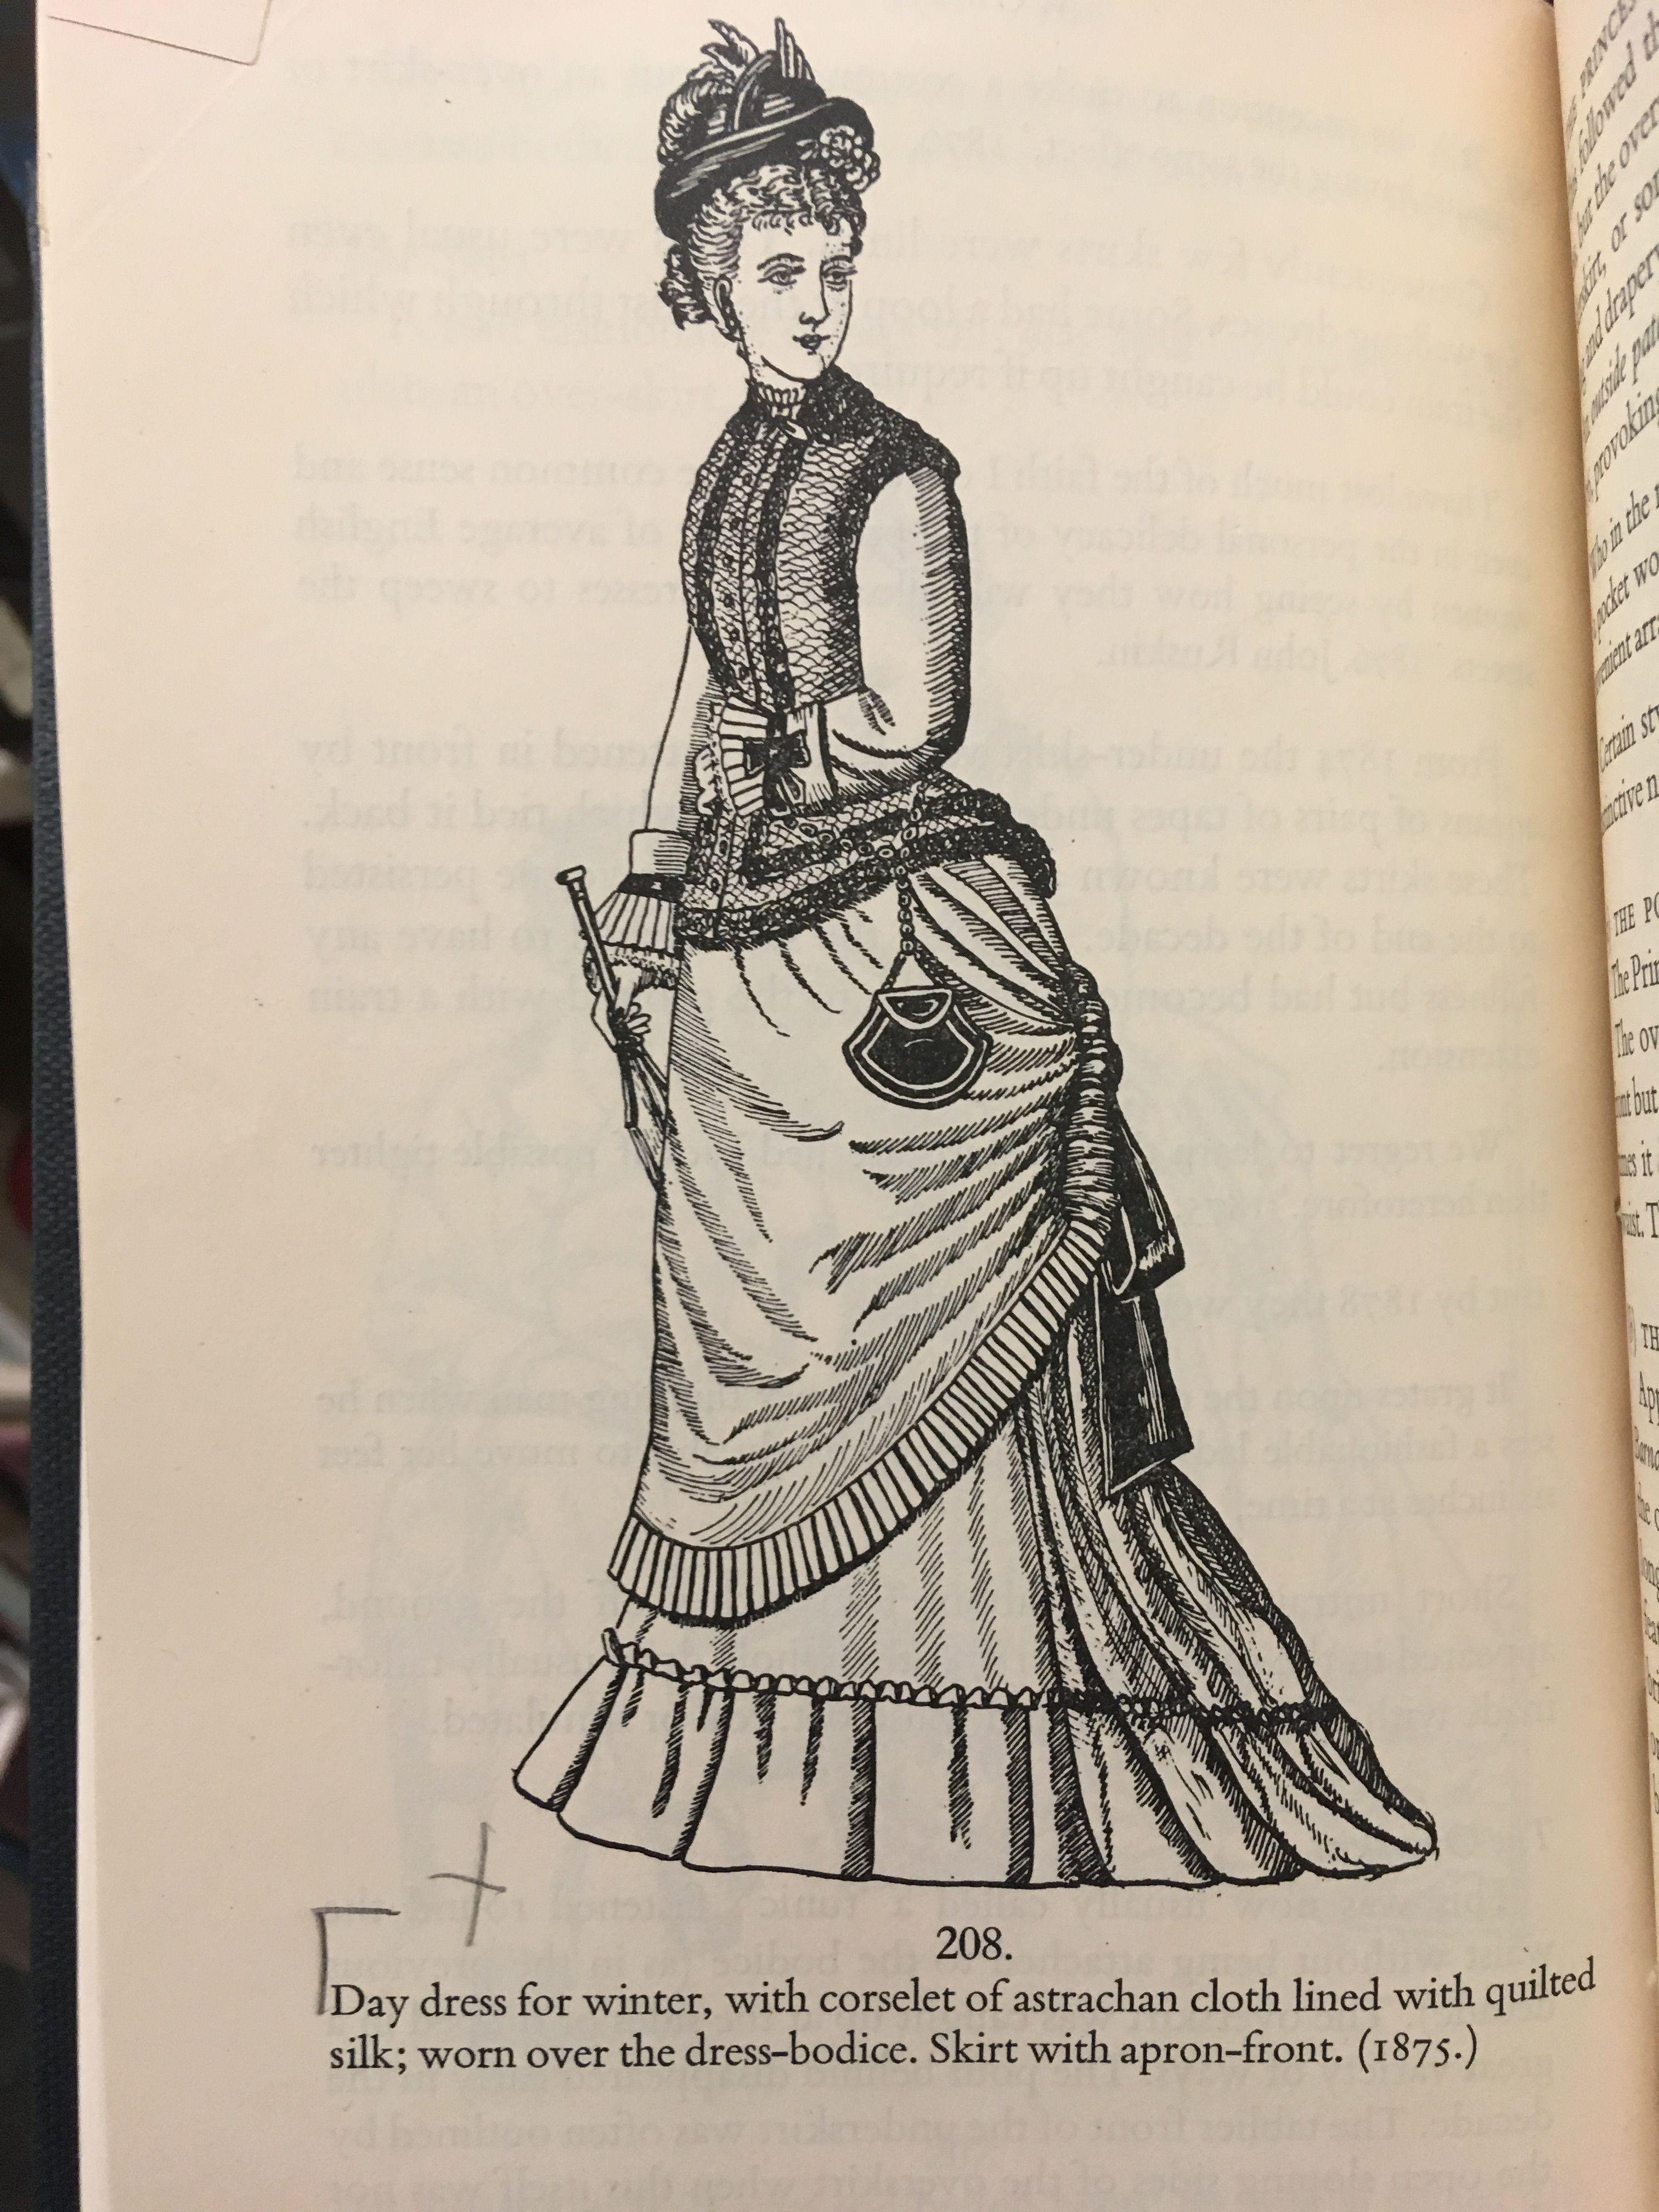 Handbook of English Costume in the Eighteenth Century